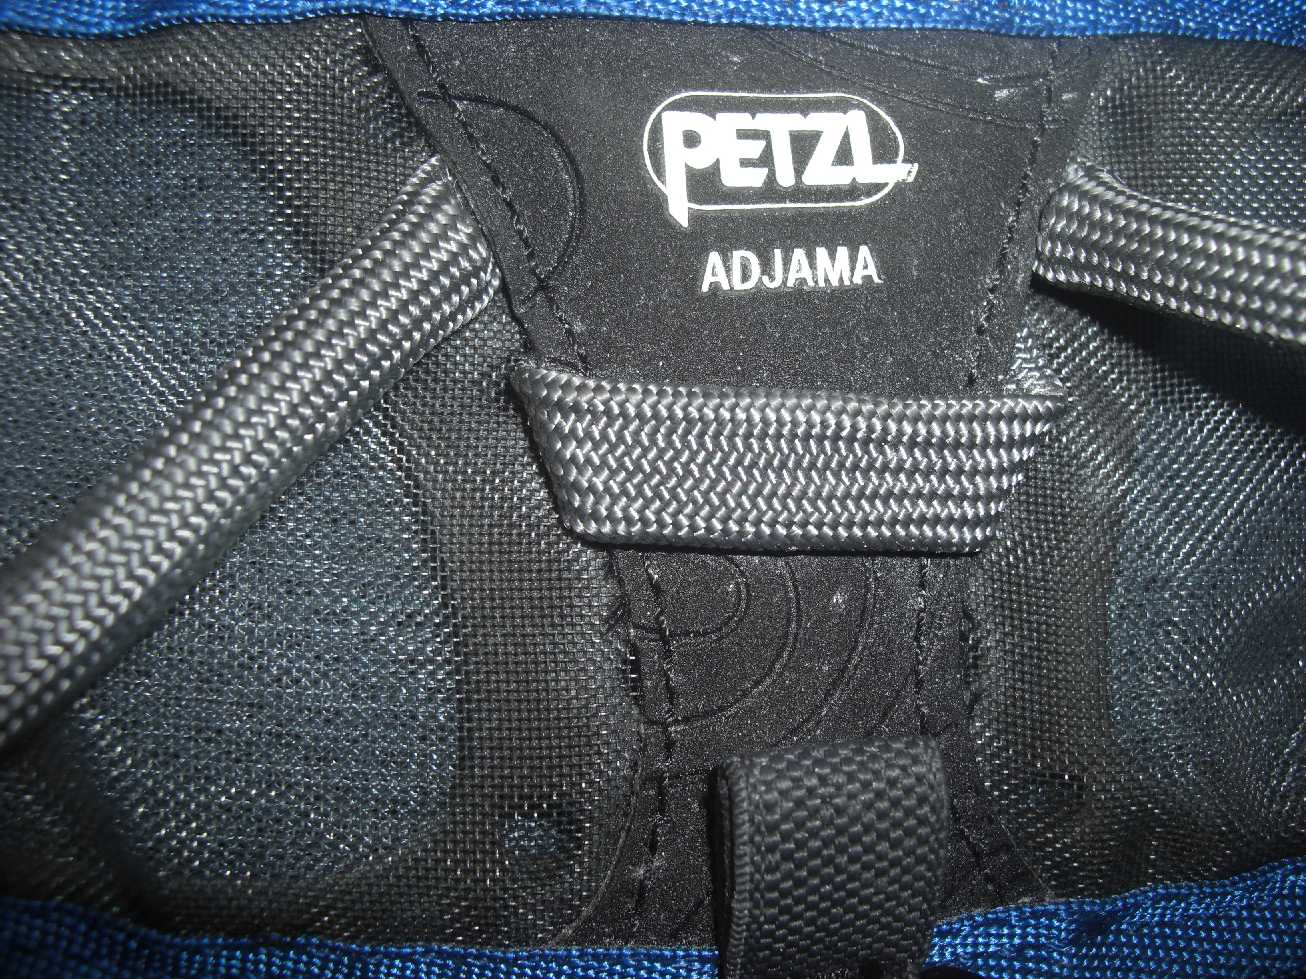 Petzl Adjama